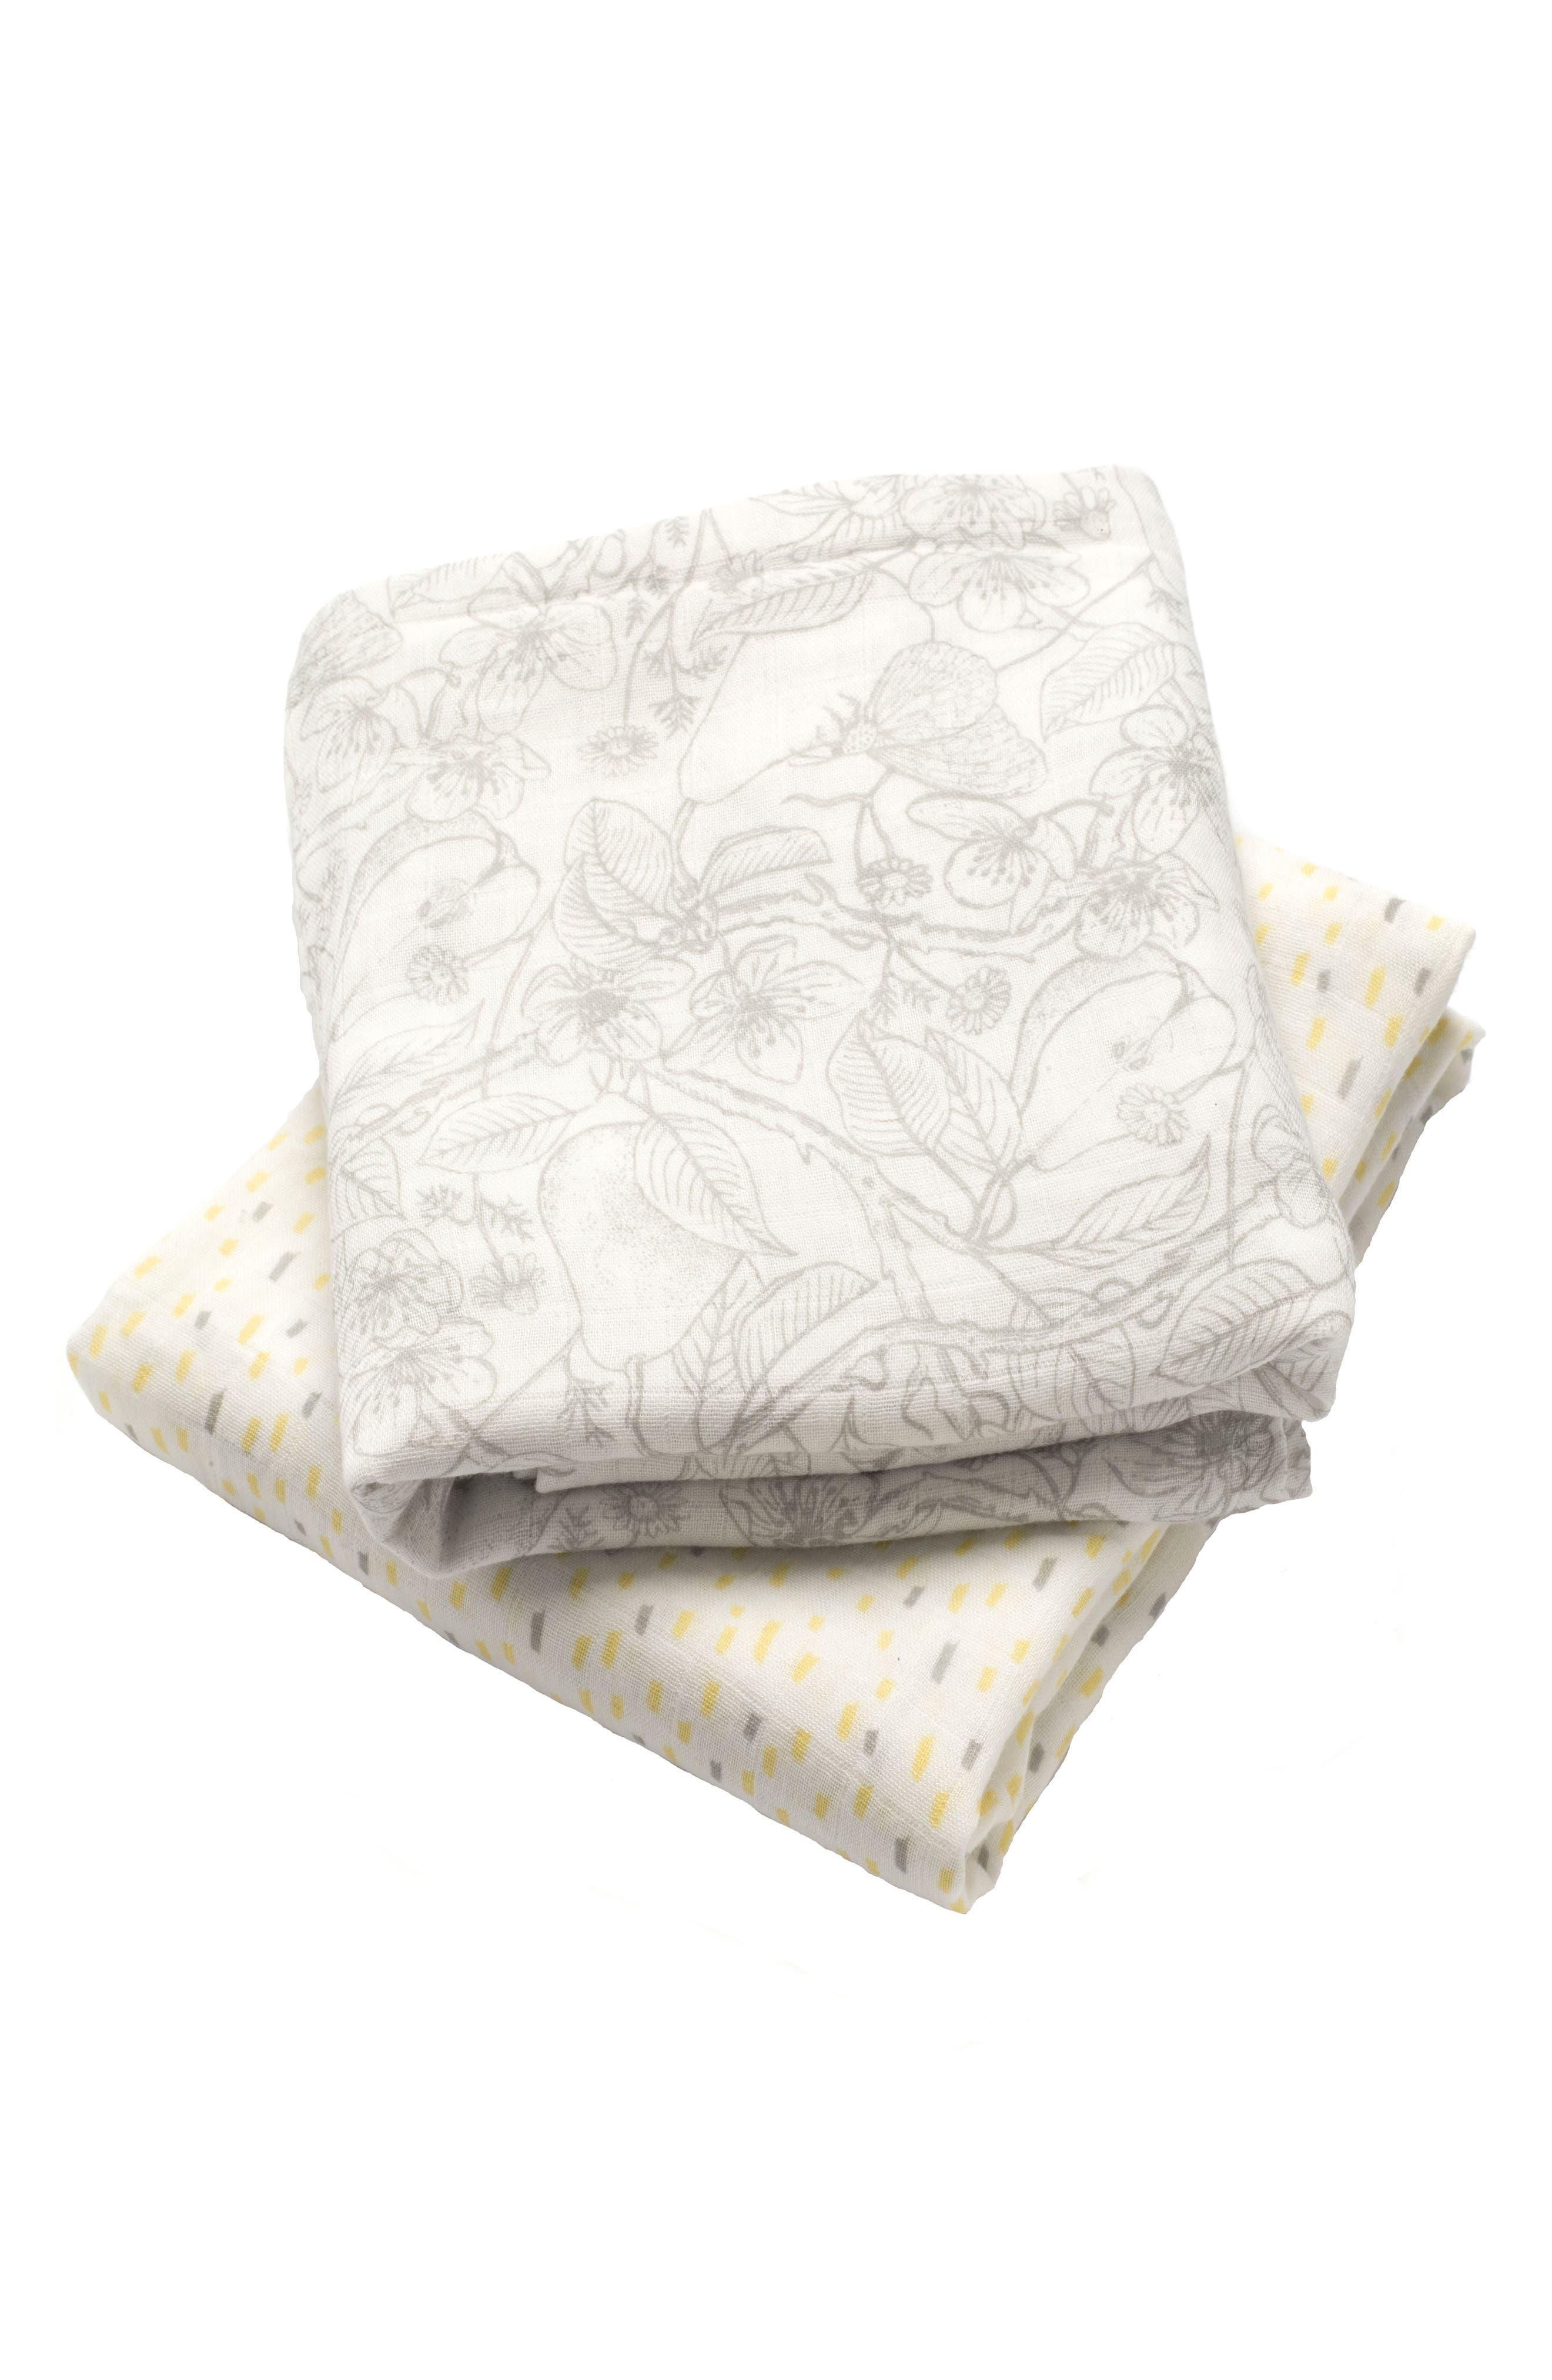 Storksak Set of 2 Muslin Swaddling Cloths